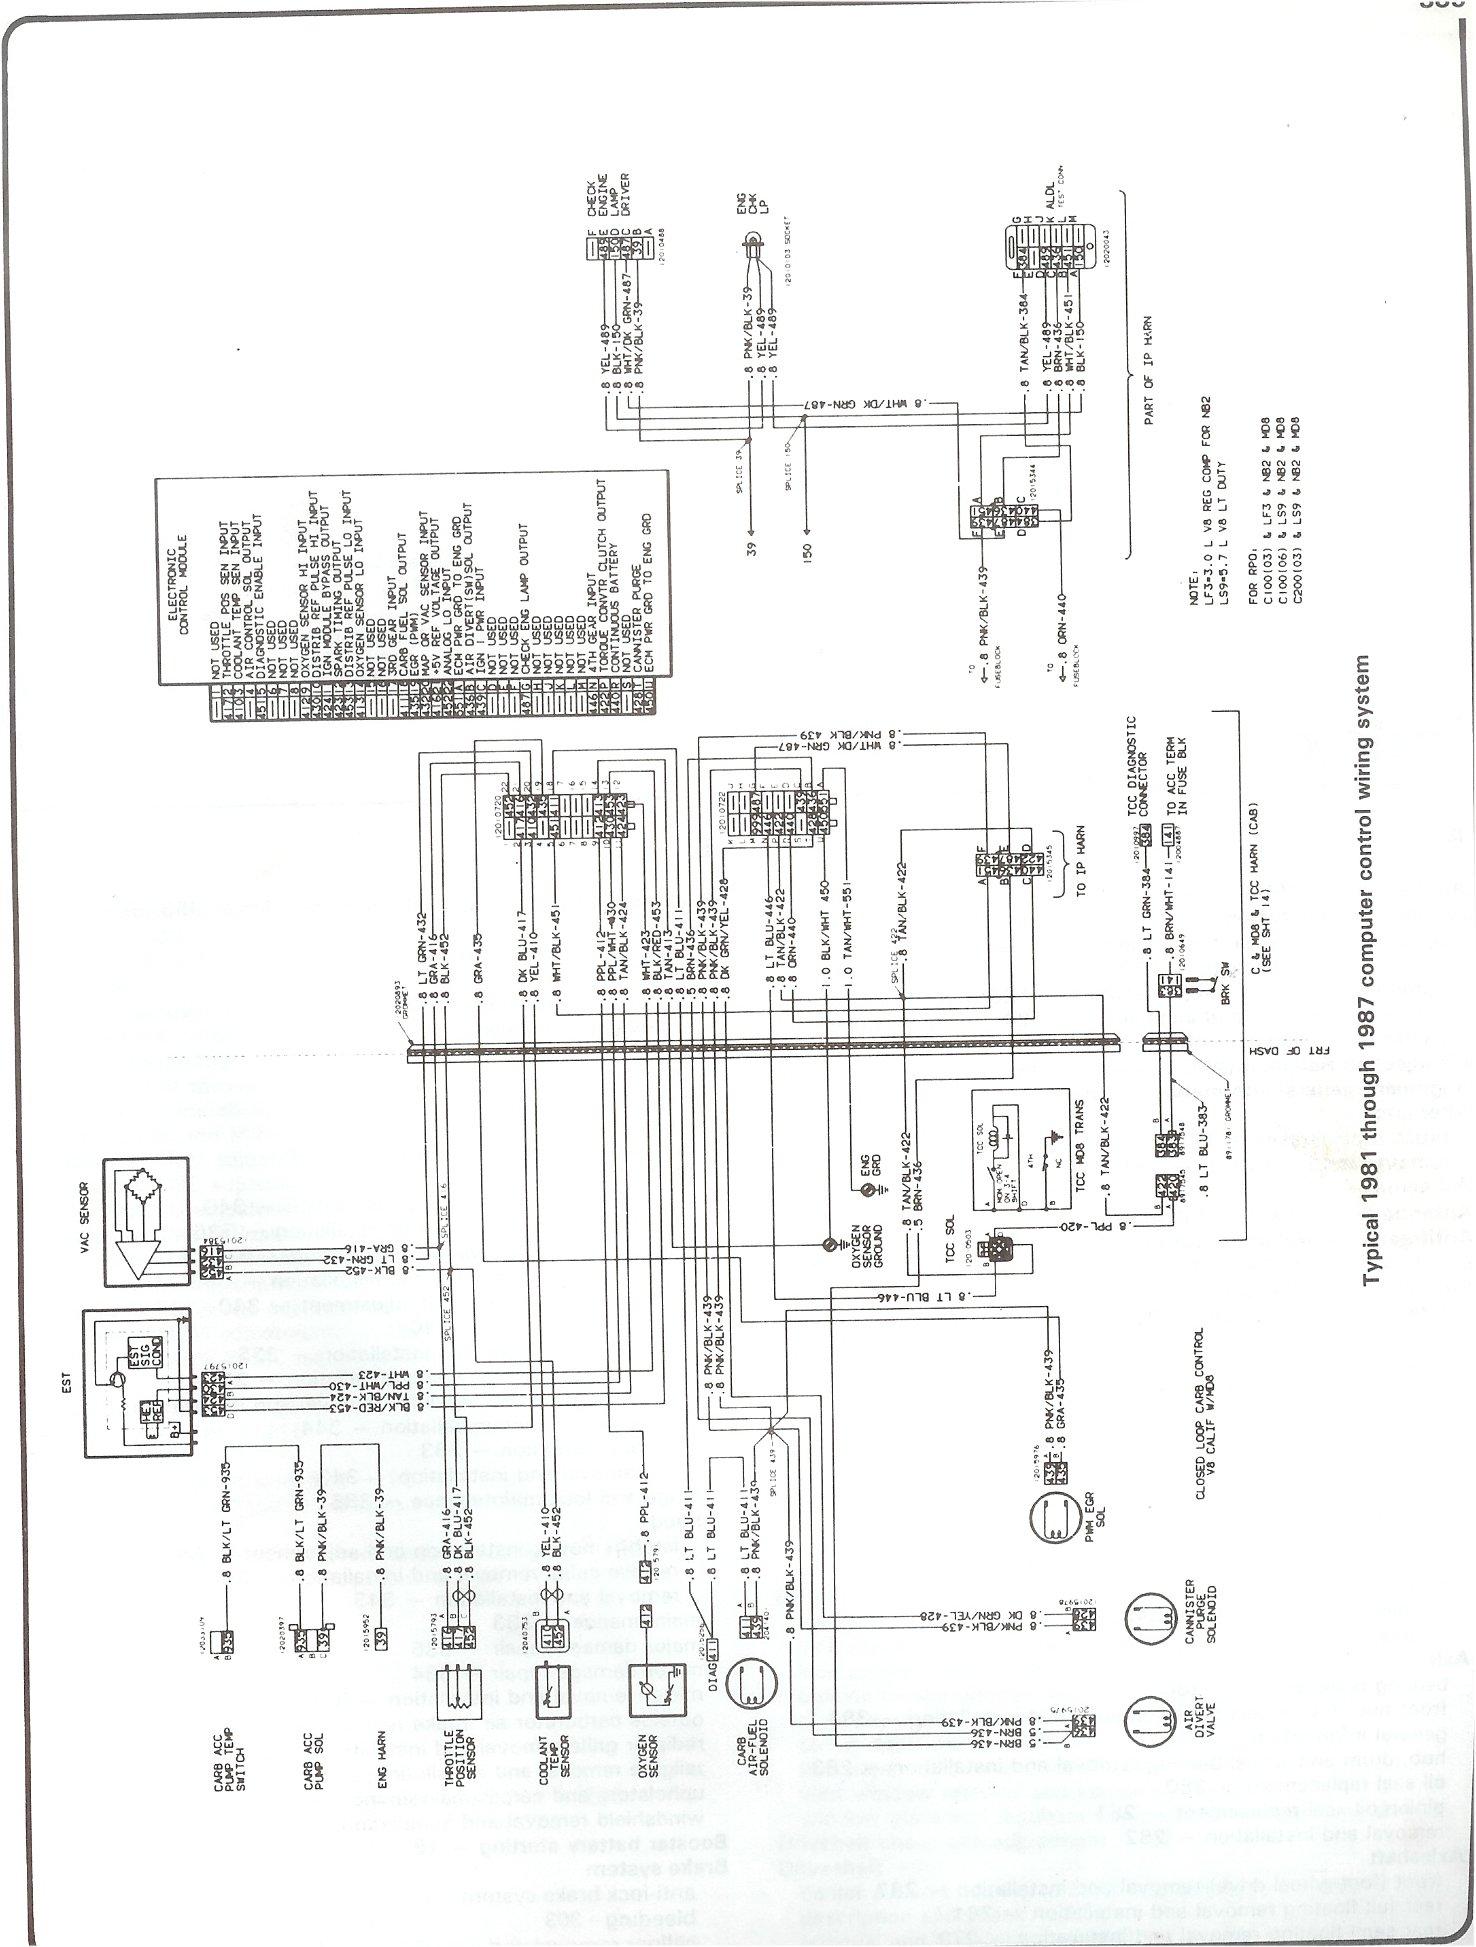 1984 Chevy P30 Wiring Diagram on 1990 Gmc Sierra Fuse Box Diagram